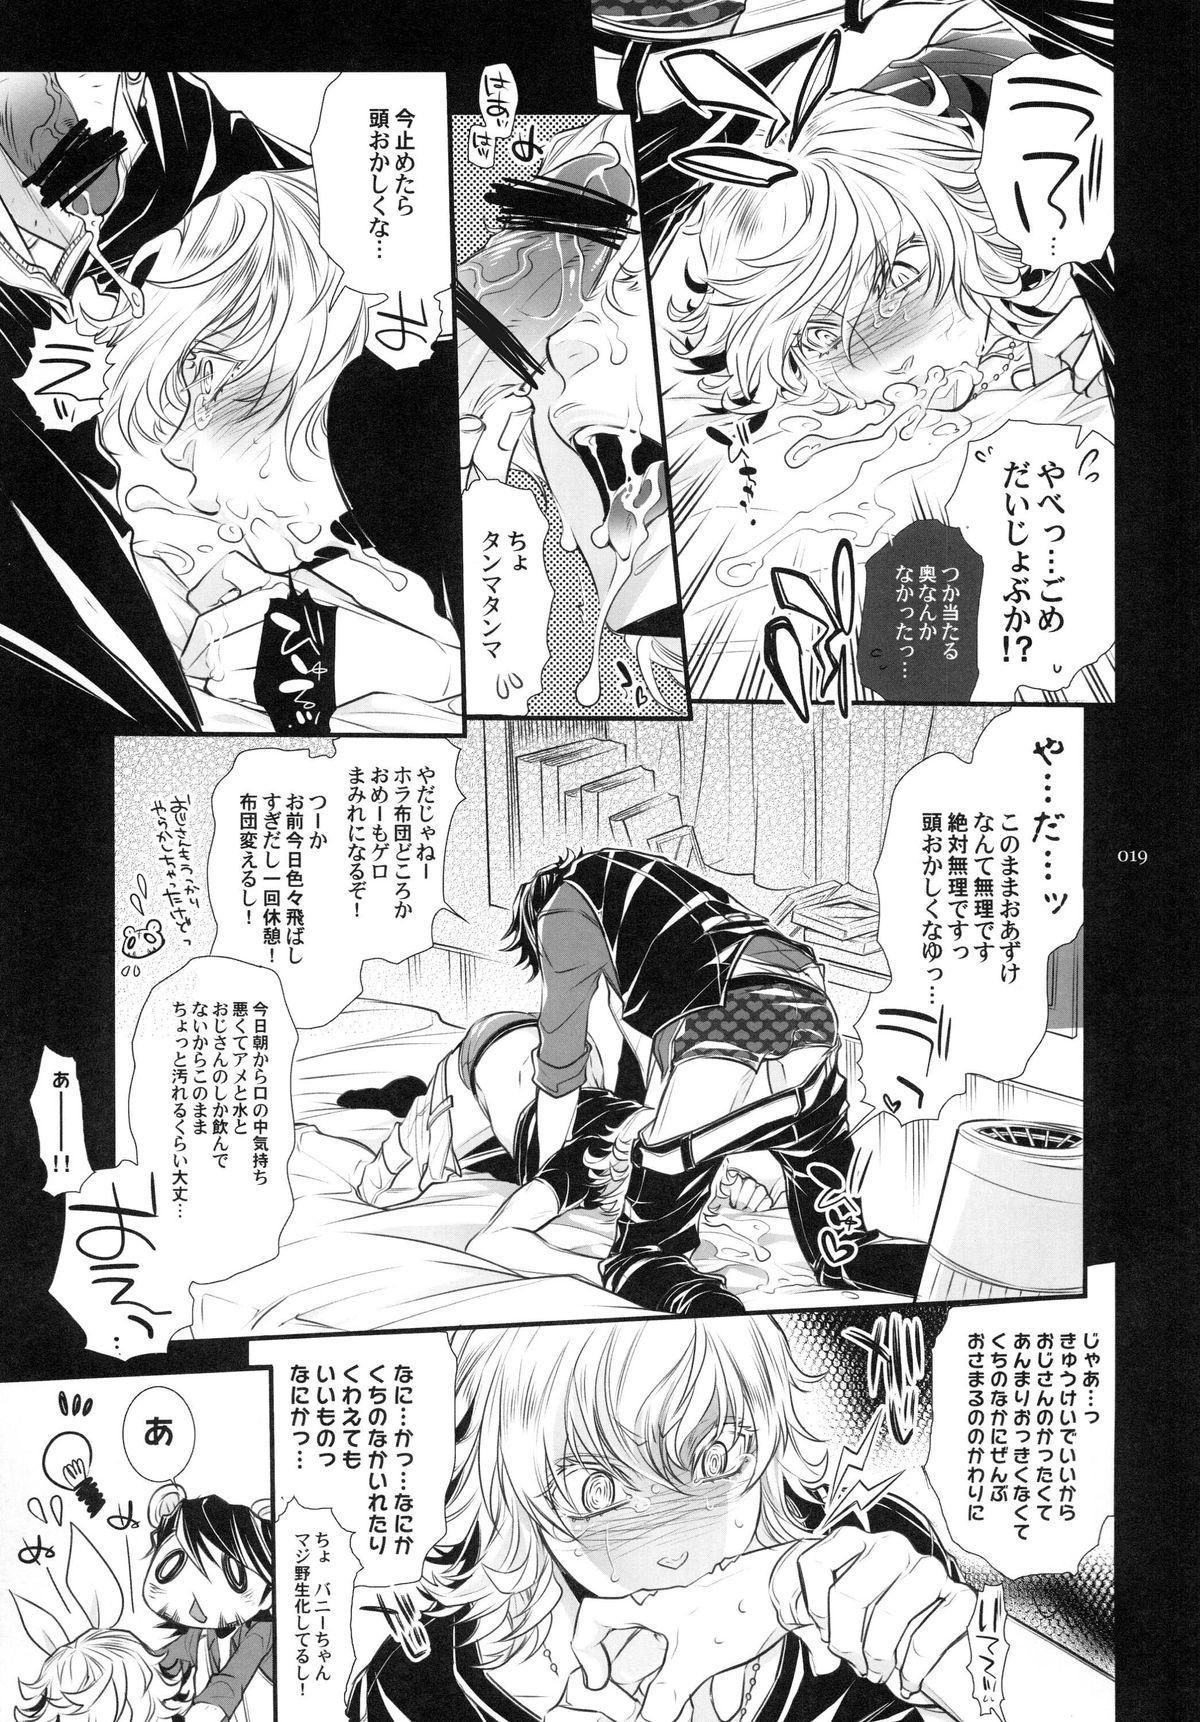 Bunny-chan to Iikoto Shiyokka 18